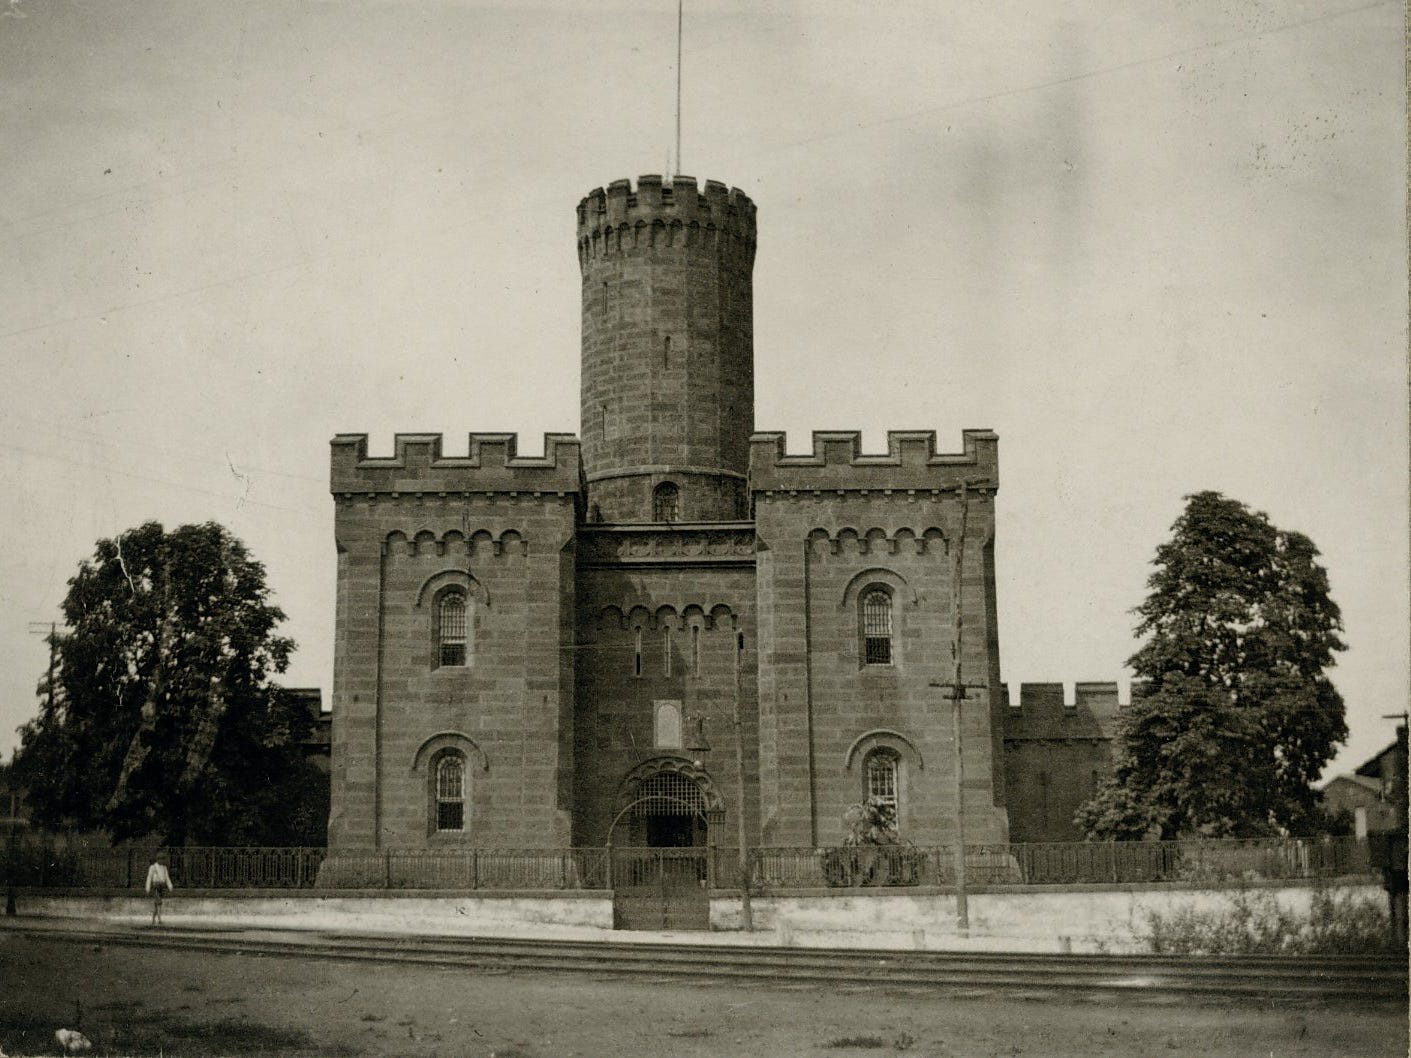 York County Prison 1860. photo courtesy of York County History Center